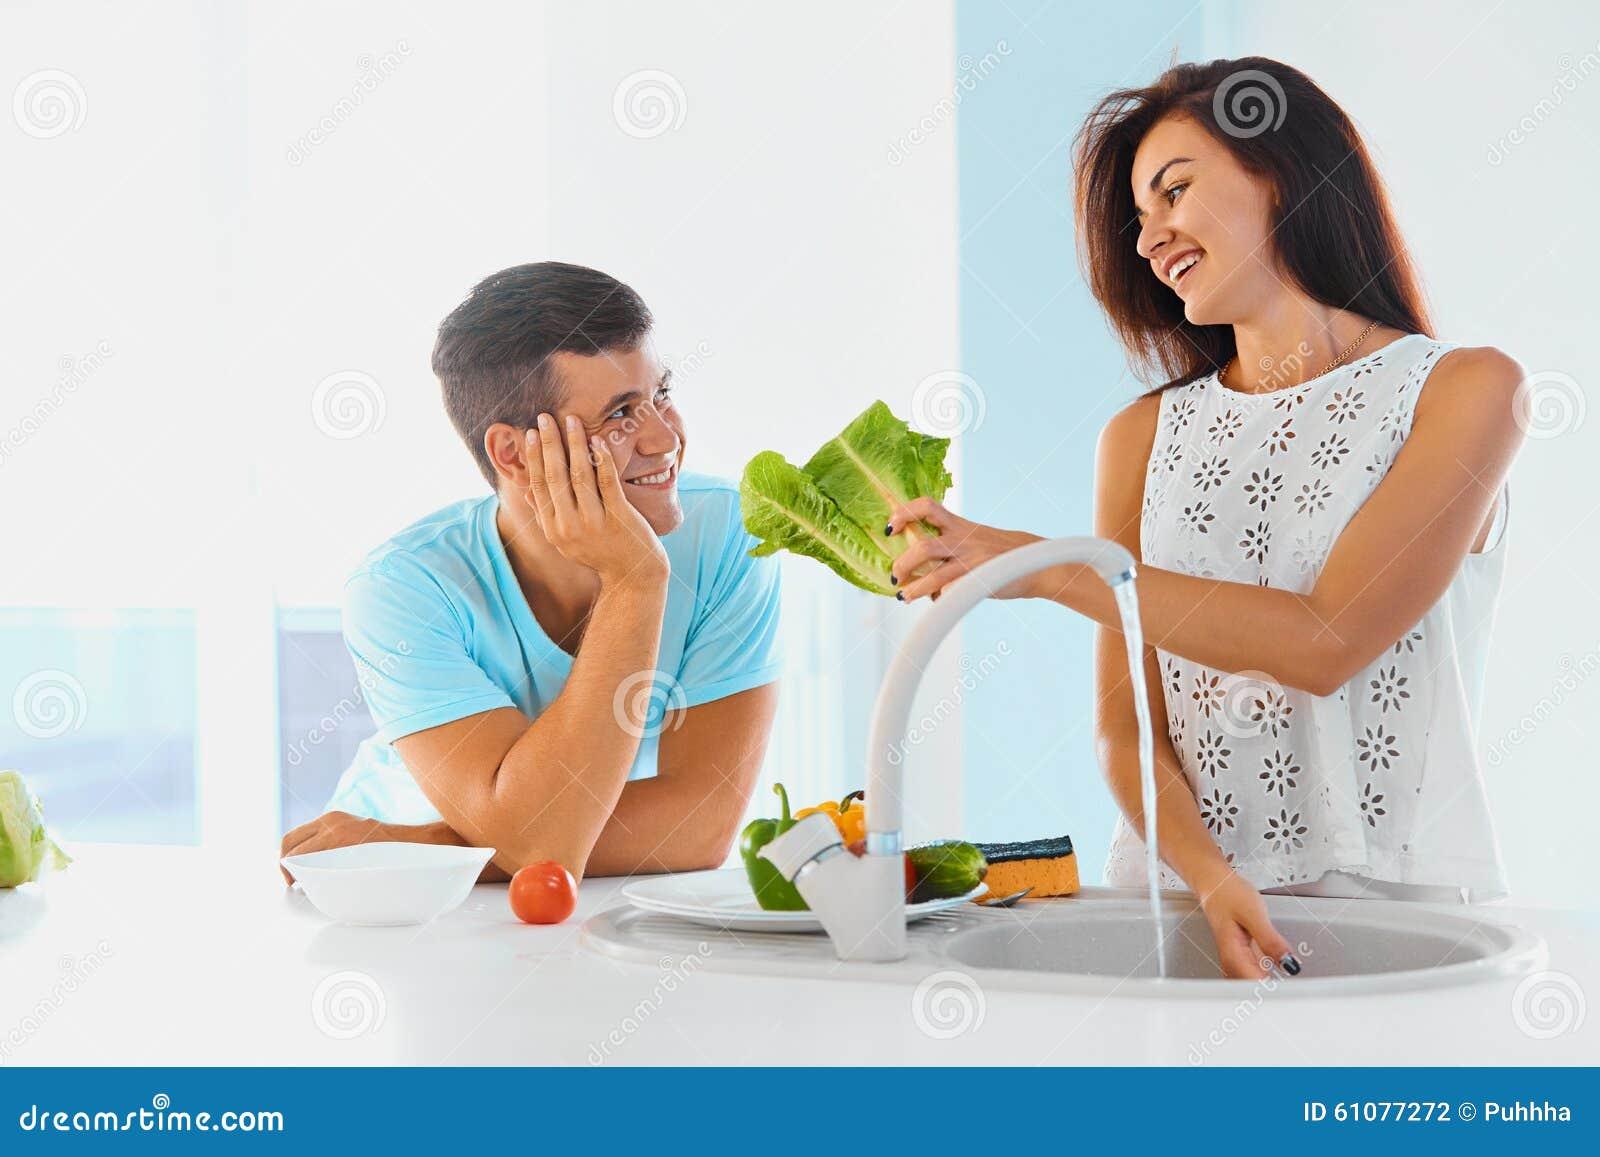 Dinner preparation. Loving couple washing vegetables.